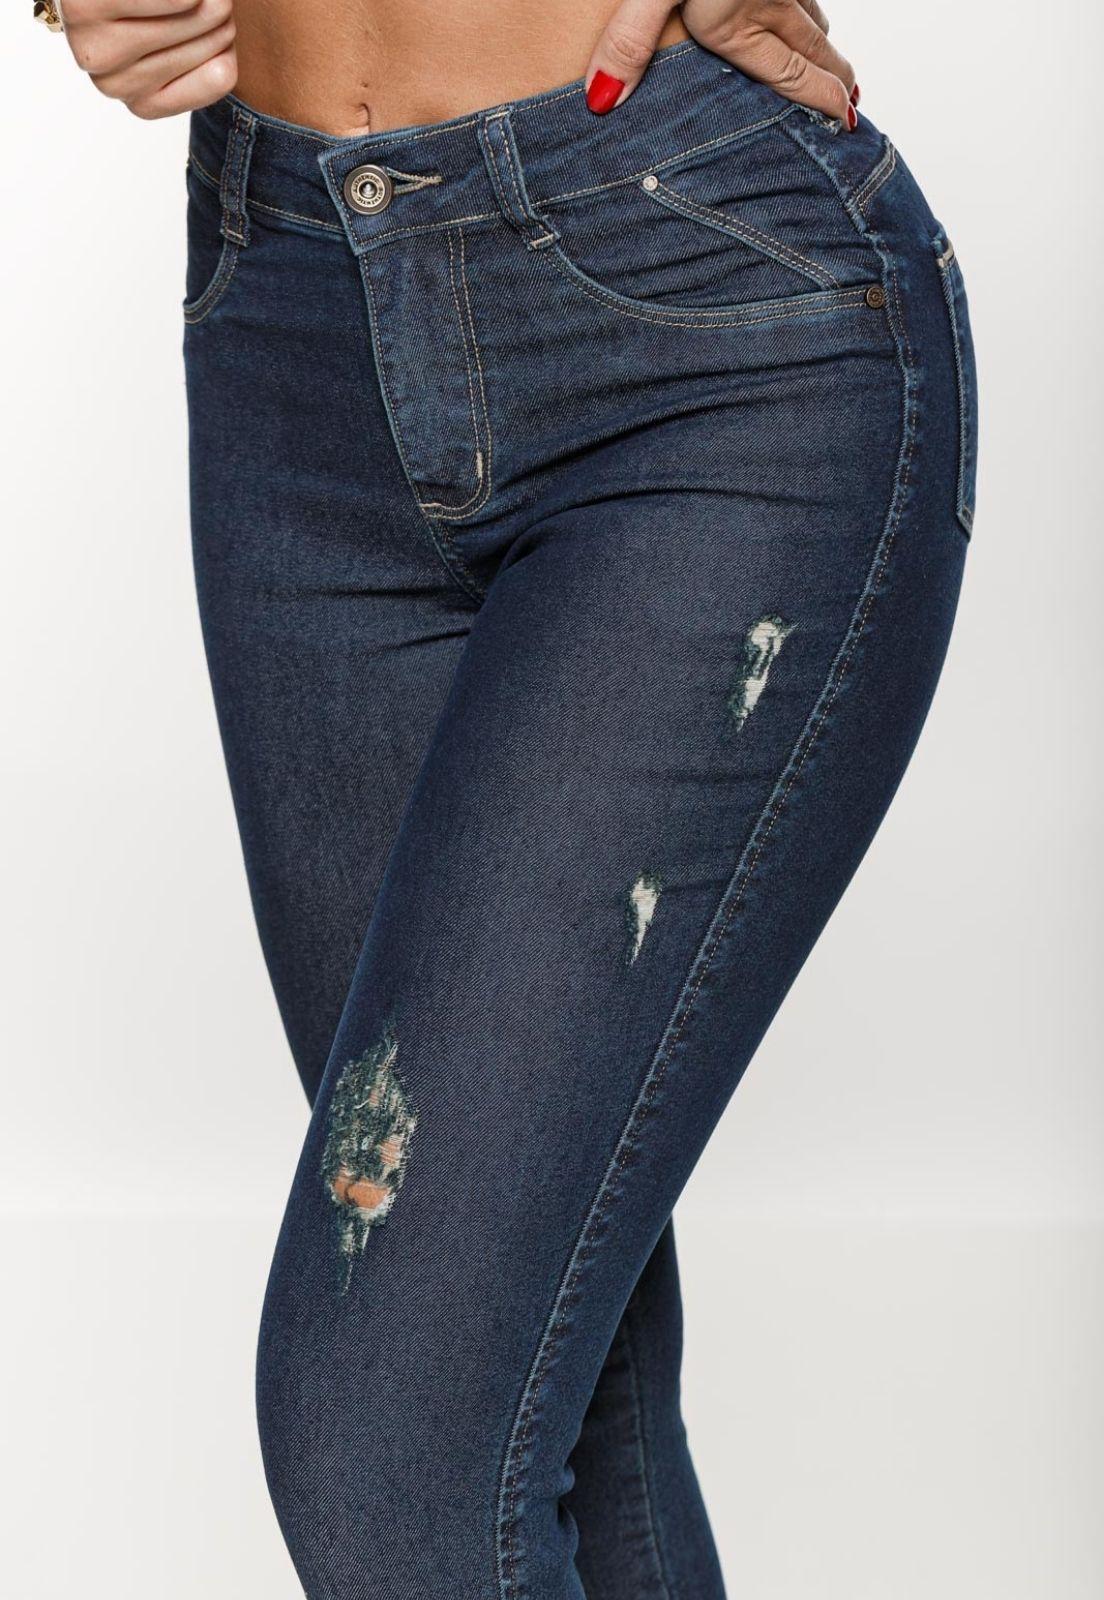 Cigarrete  Jeans Feminina Crocker - 48105  - CROCKER JEANS